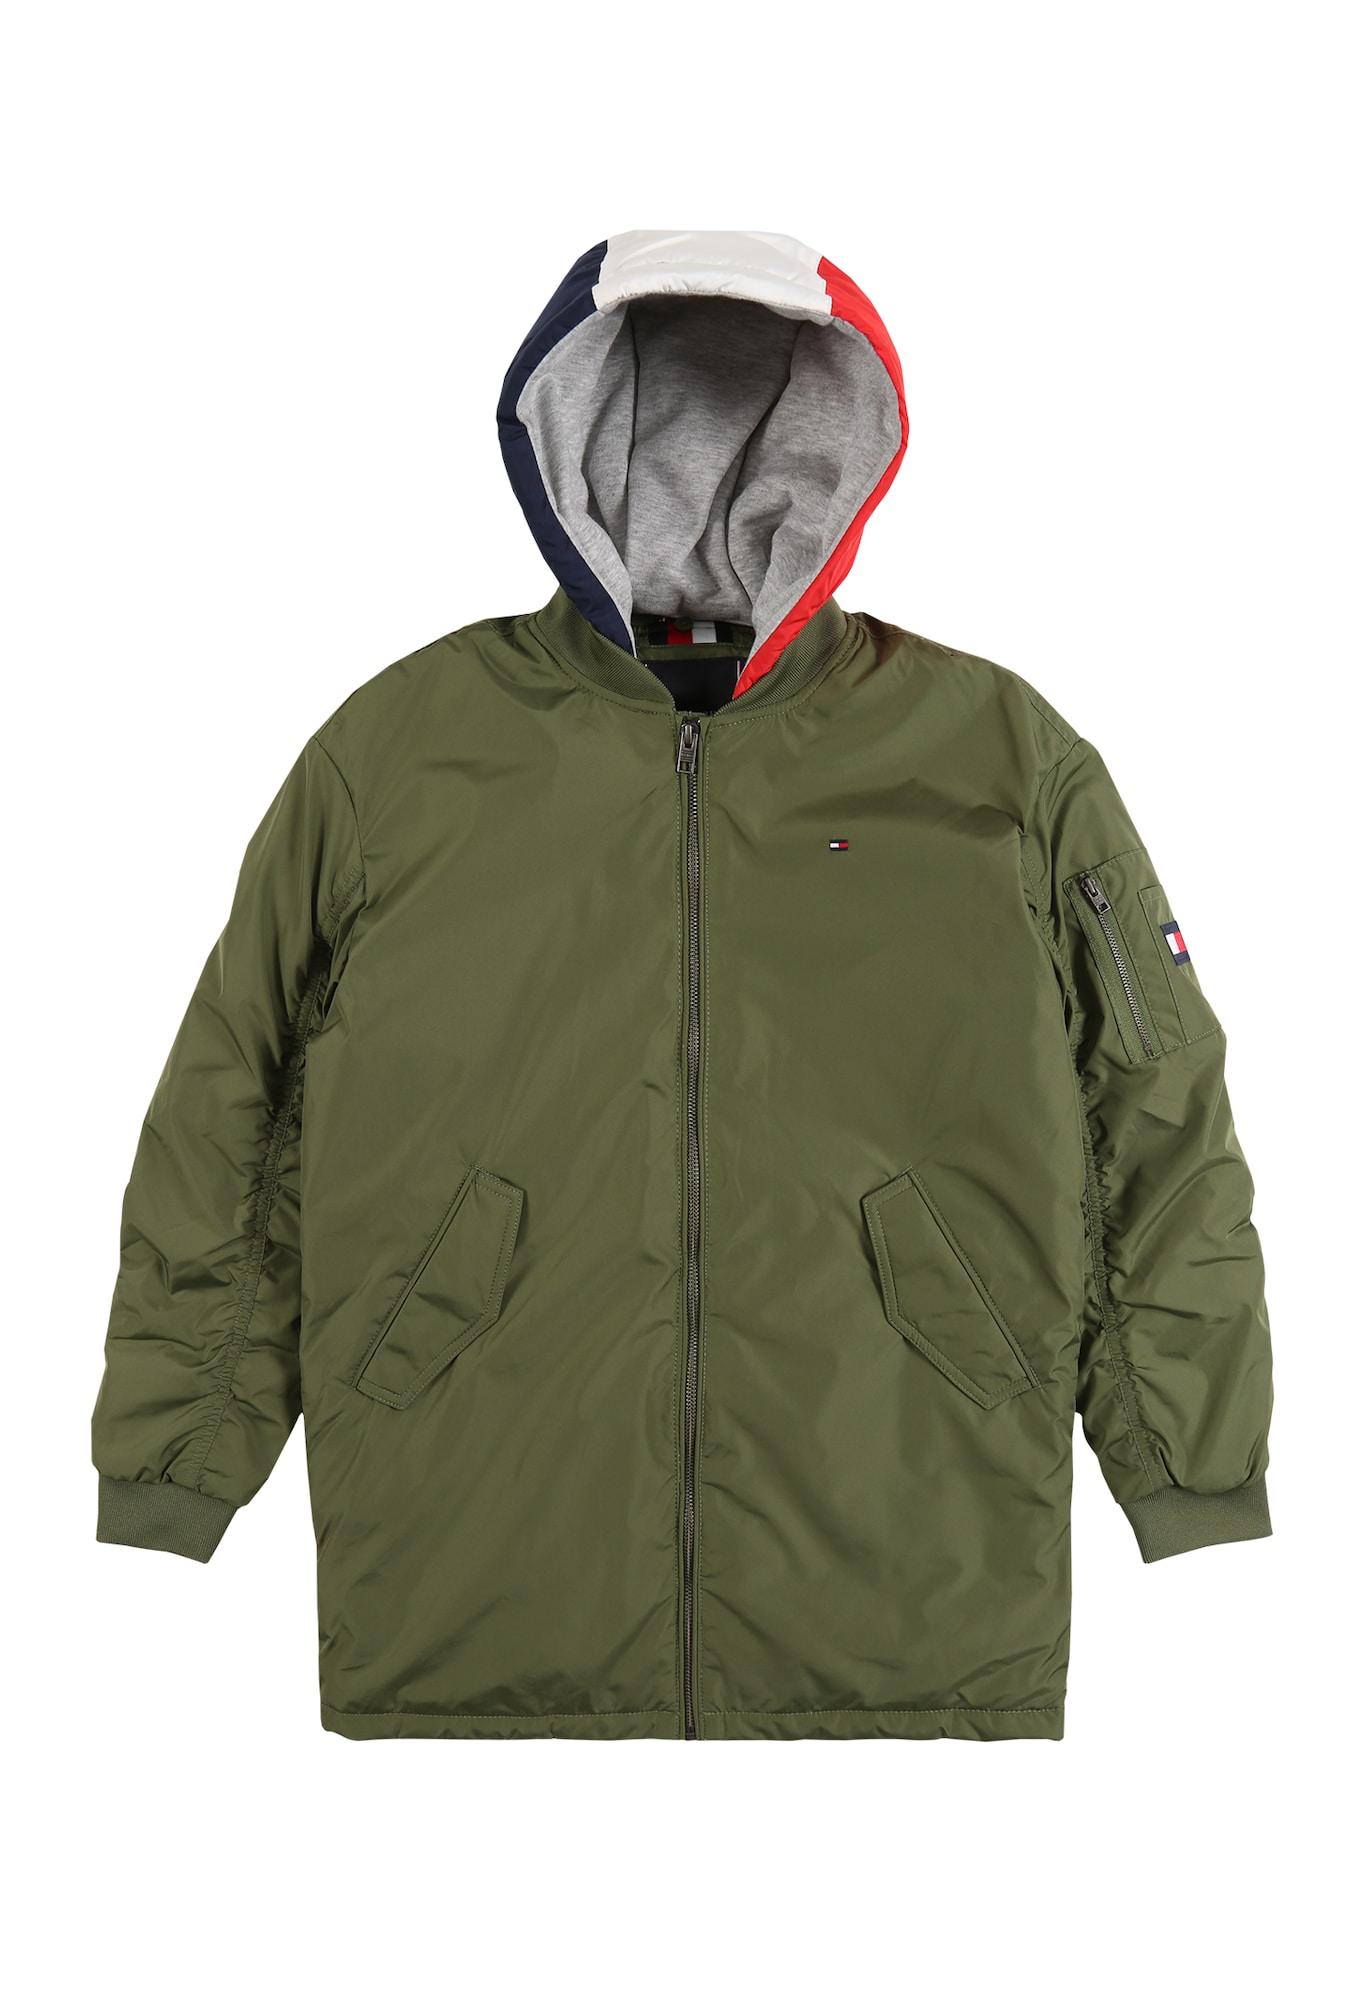 TOMMY HILFIGER Prechodná bunda  červená / olivová / biela / námornícka modrá